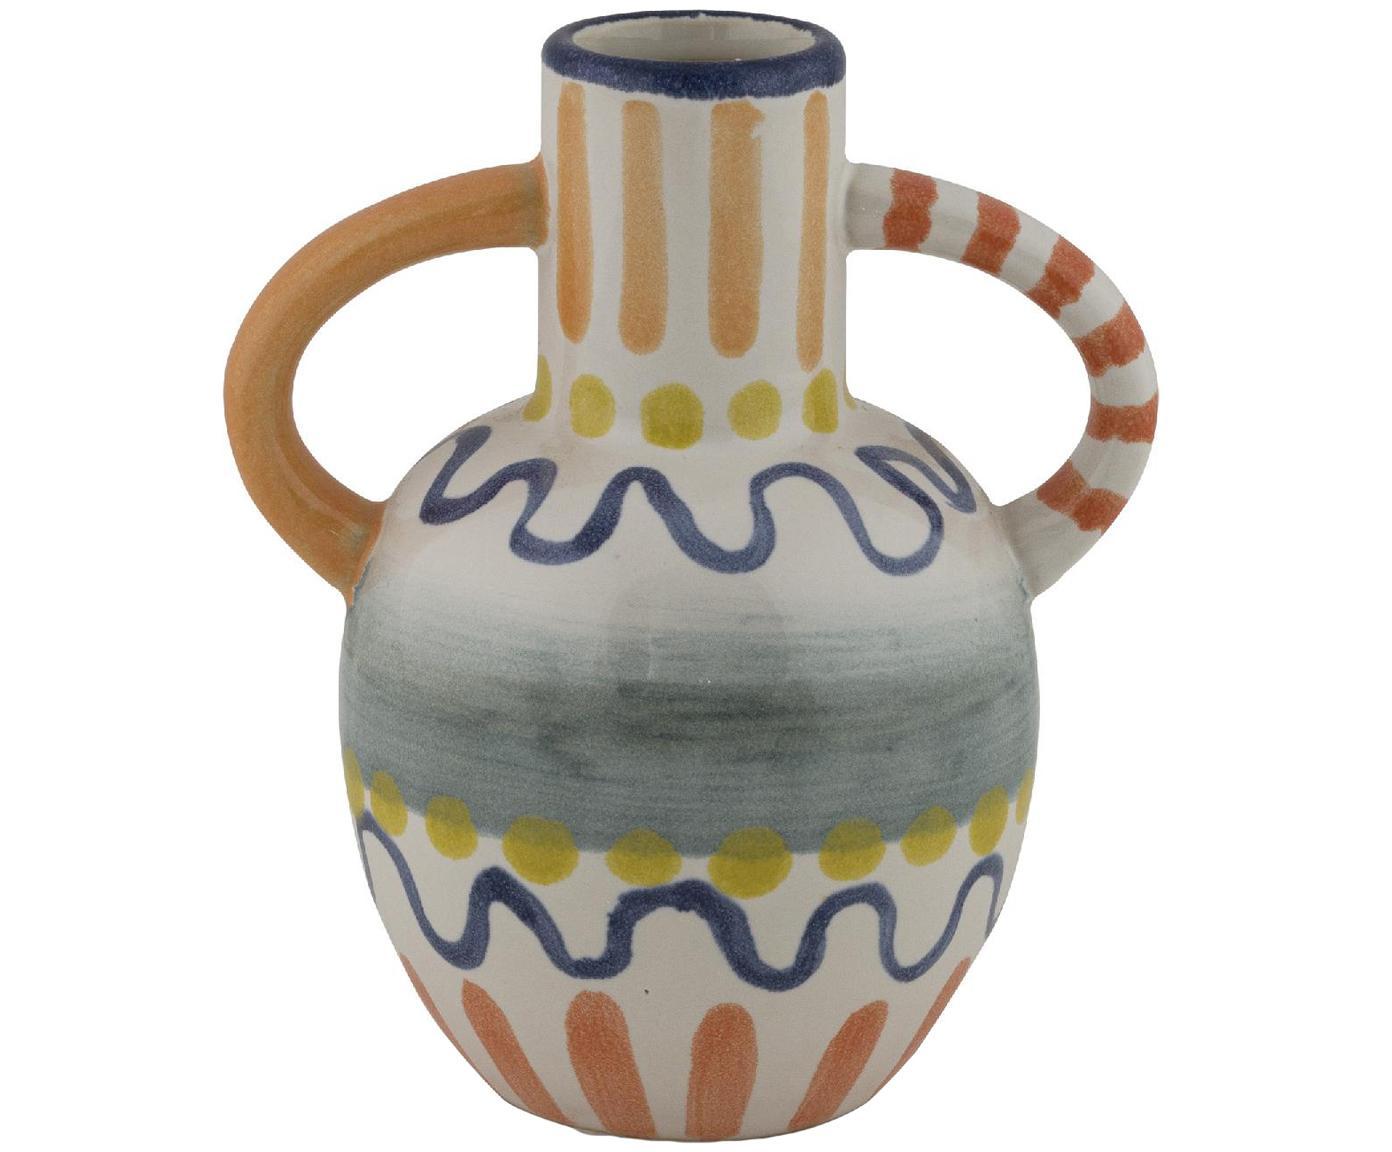 Kleine bemalte Vase Majorelle aus Keramik, Keramik, Mehrfarbig, 13 x 15 cm